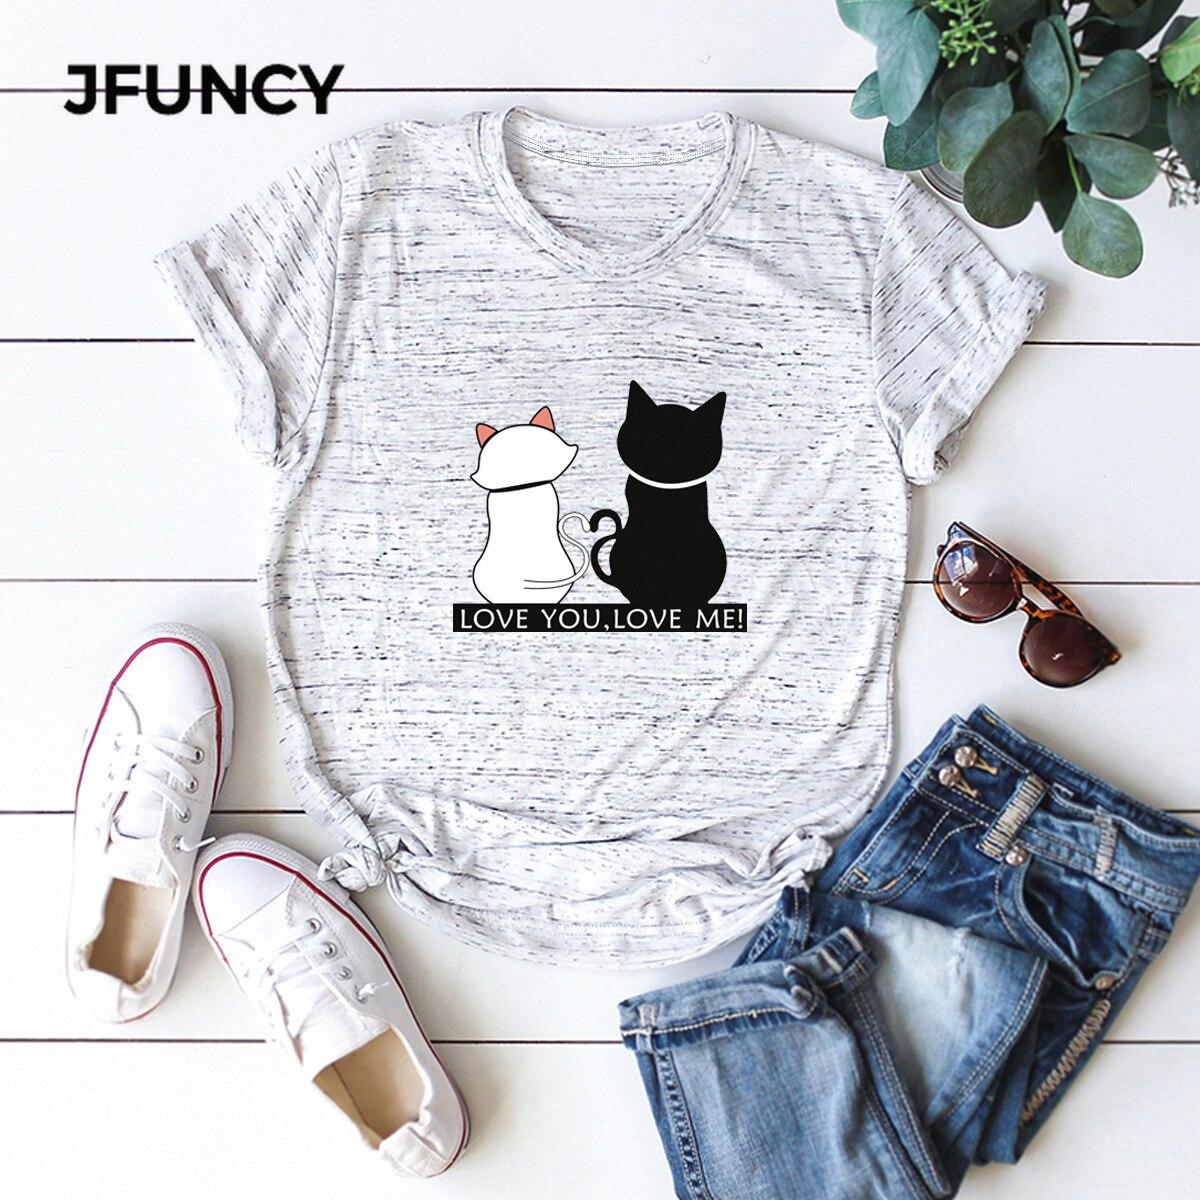 JFUNCY Summer Cotton Women T-shirts Kawaii Cartoon Cats Print T Shirt 5XL Oversize Casual Mujer Tshirt Ladies Tee Women Tops